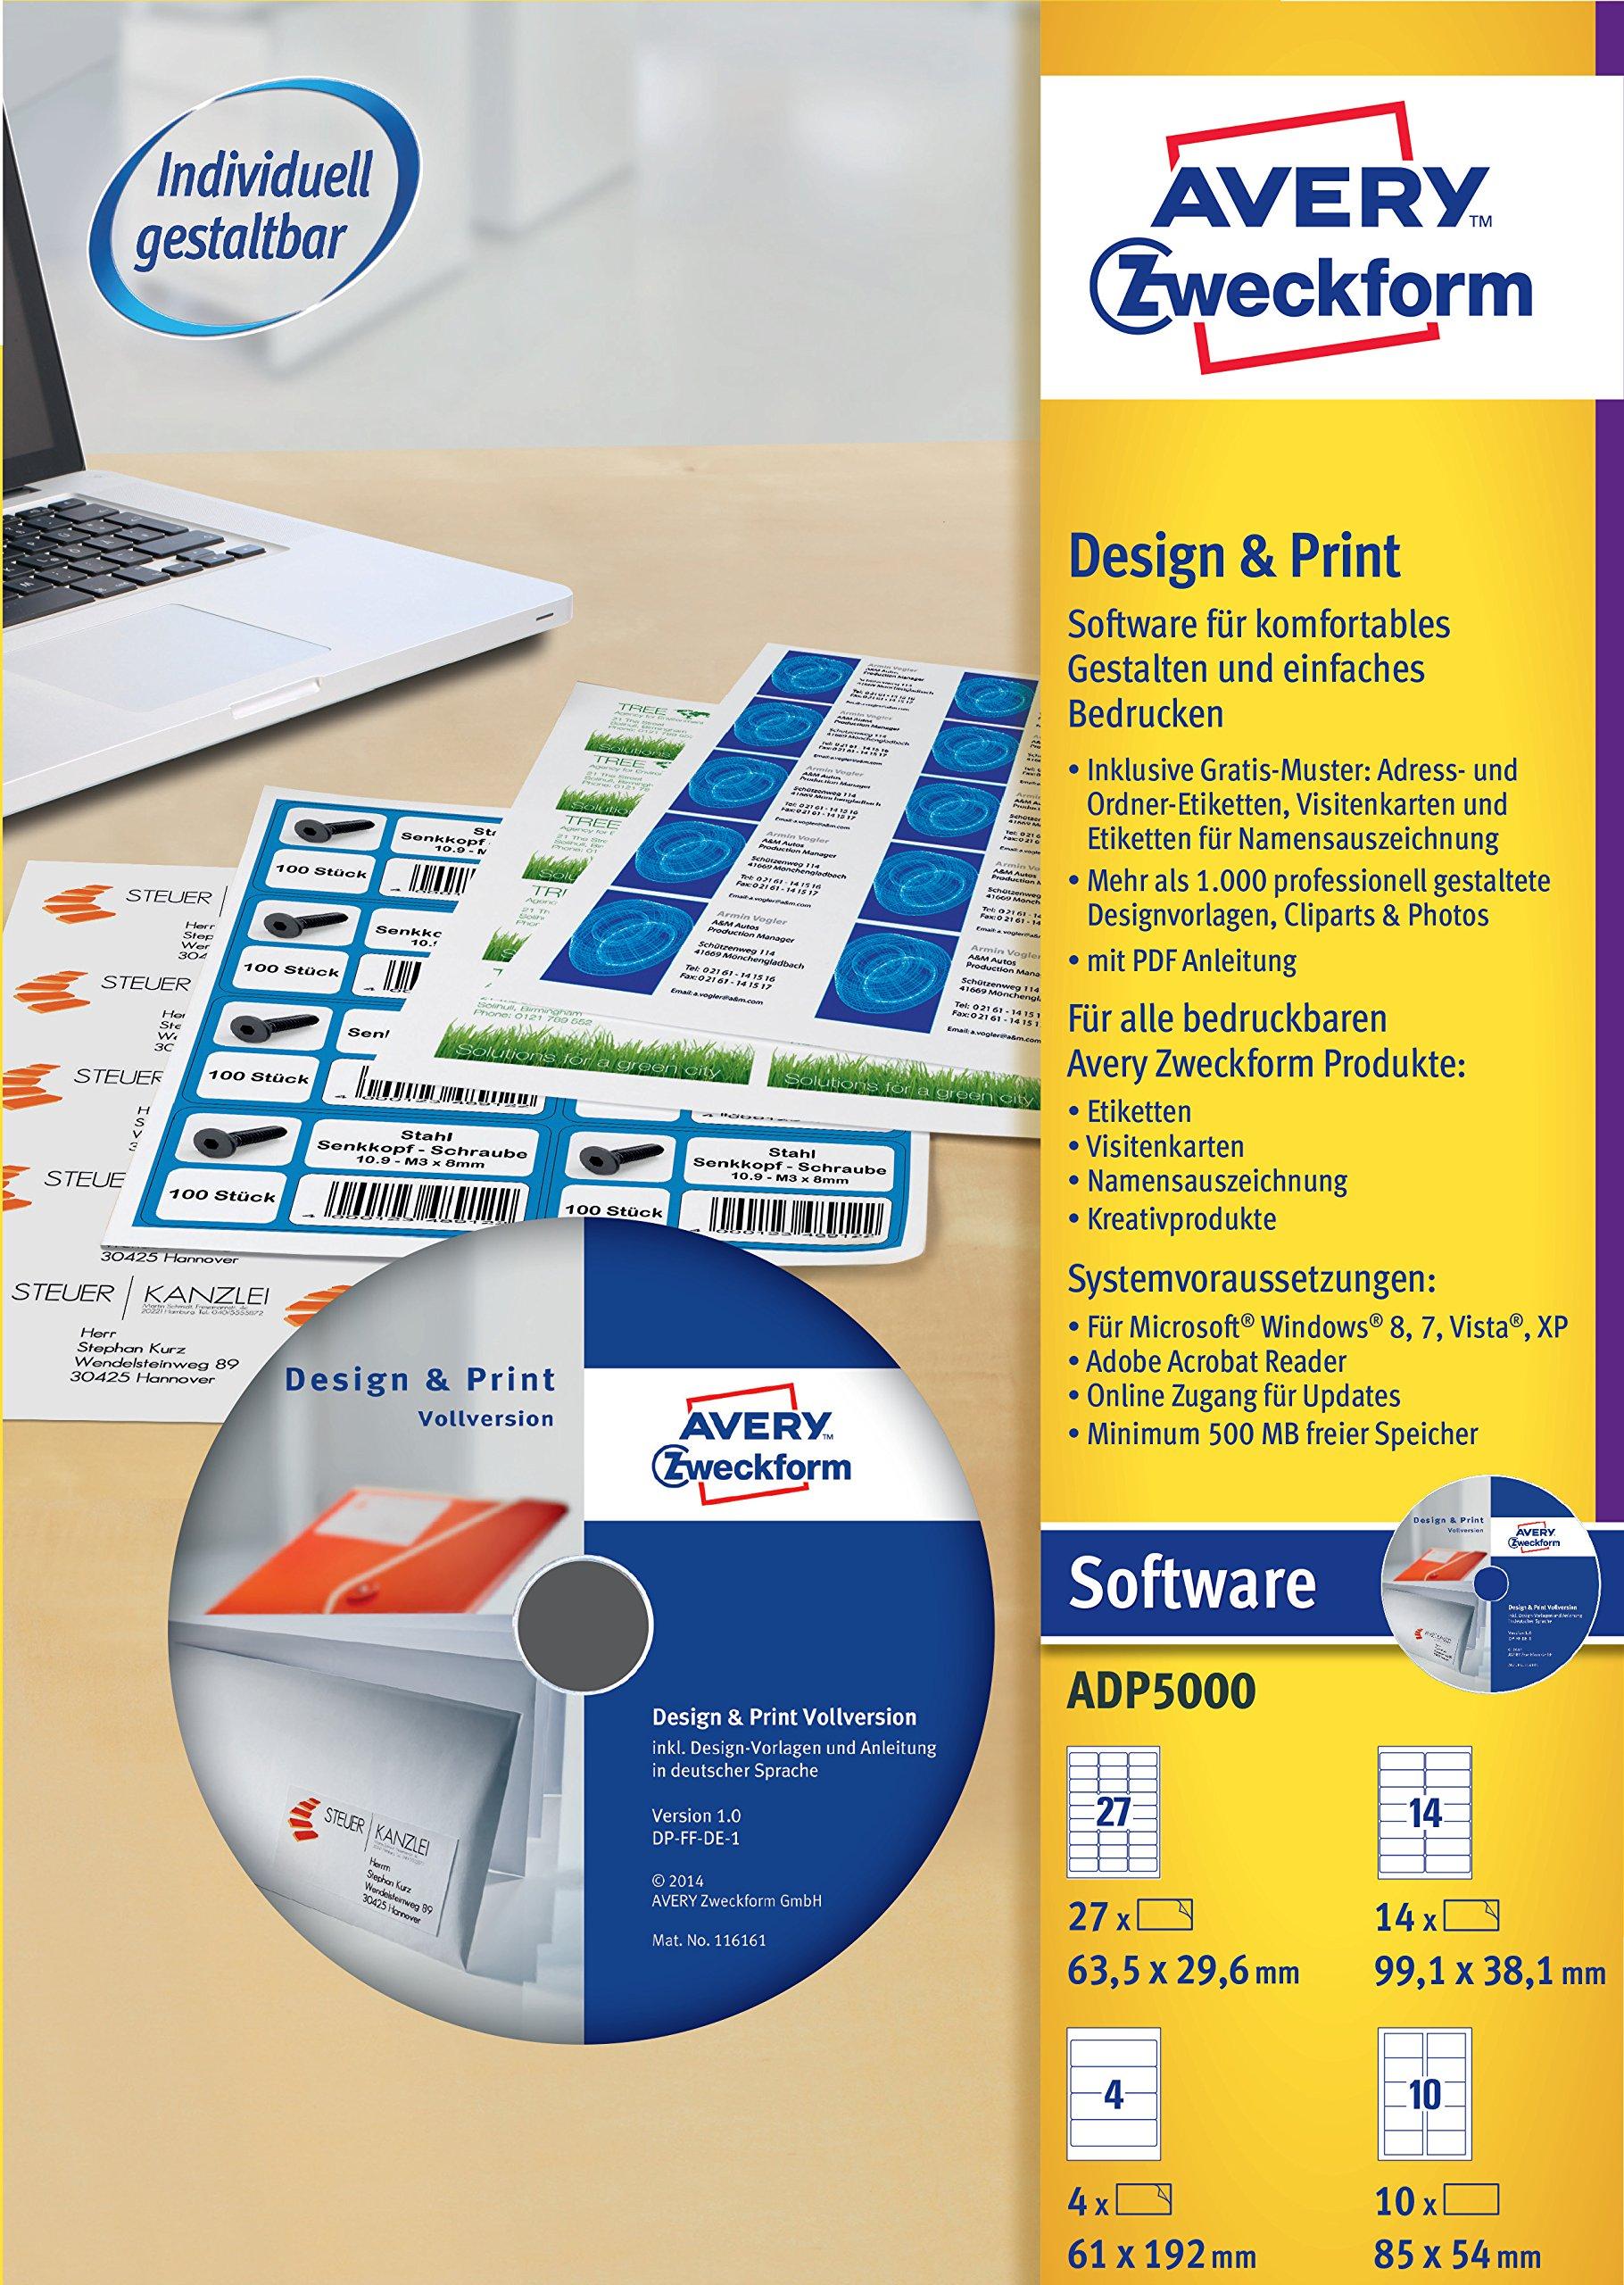 Avery Zweckform ADP5000 DesignPro 5.0 Design & Print Software Full Version [German Import]